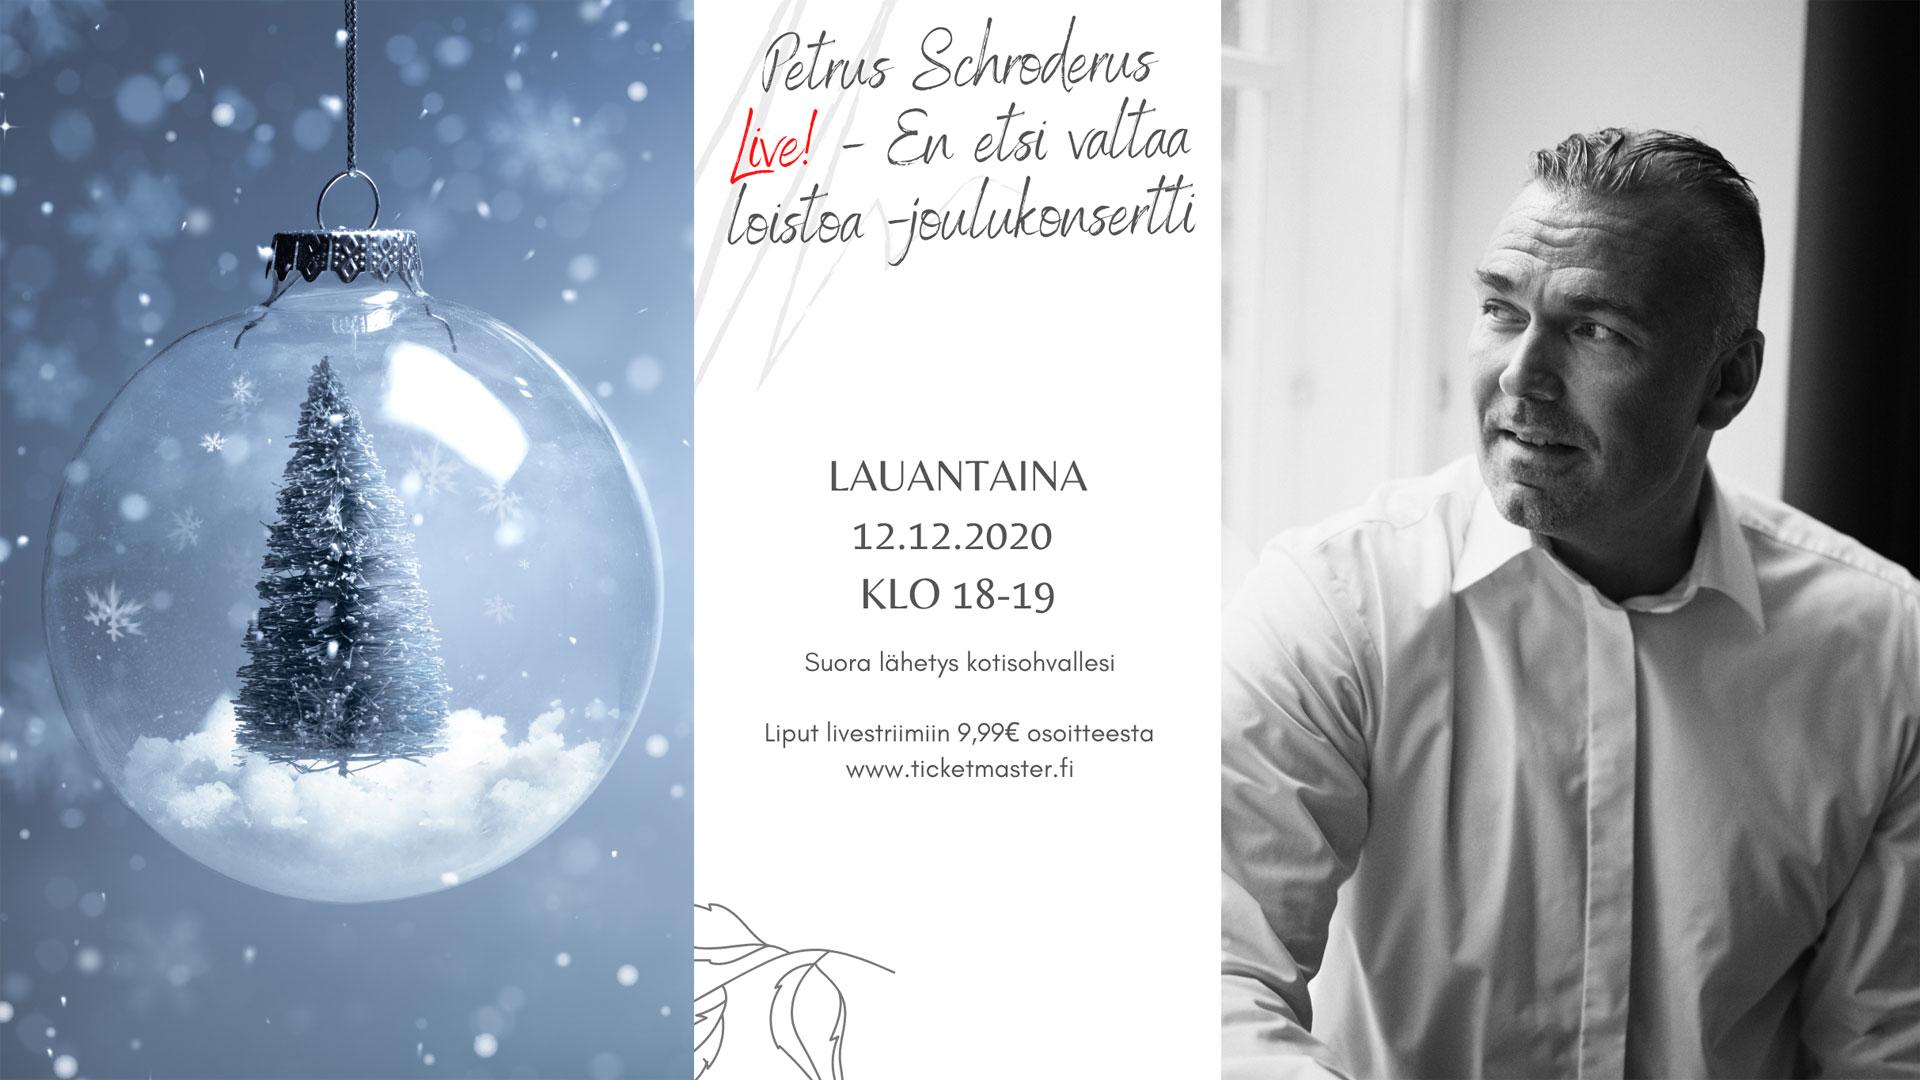 Link to event Petrus Schroderus